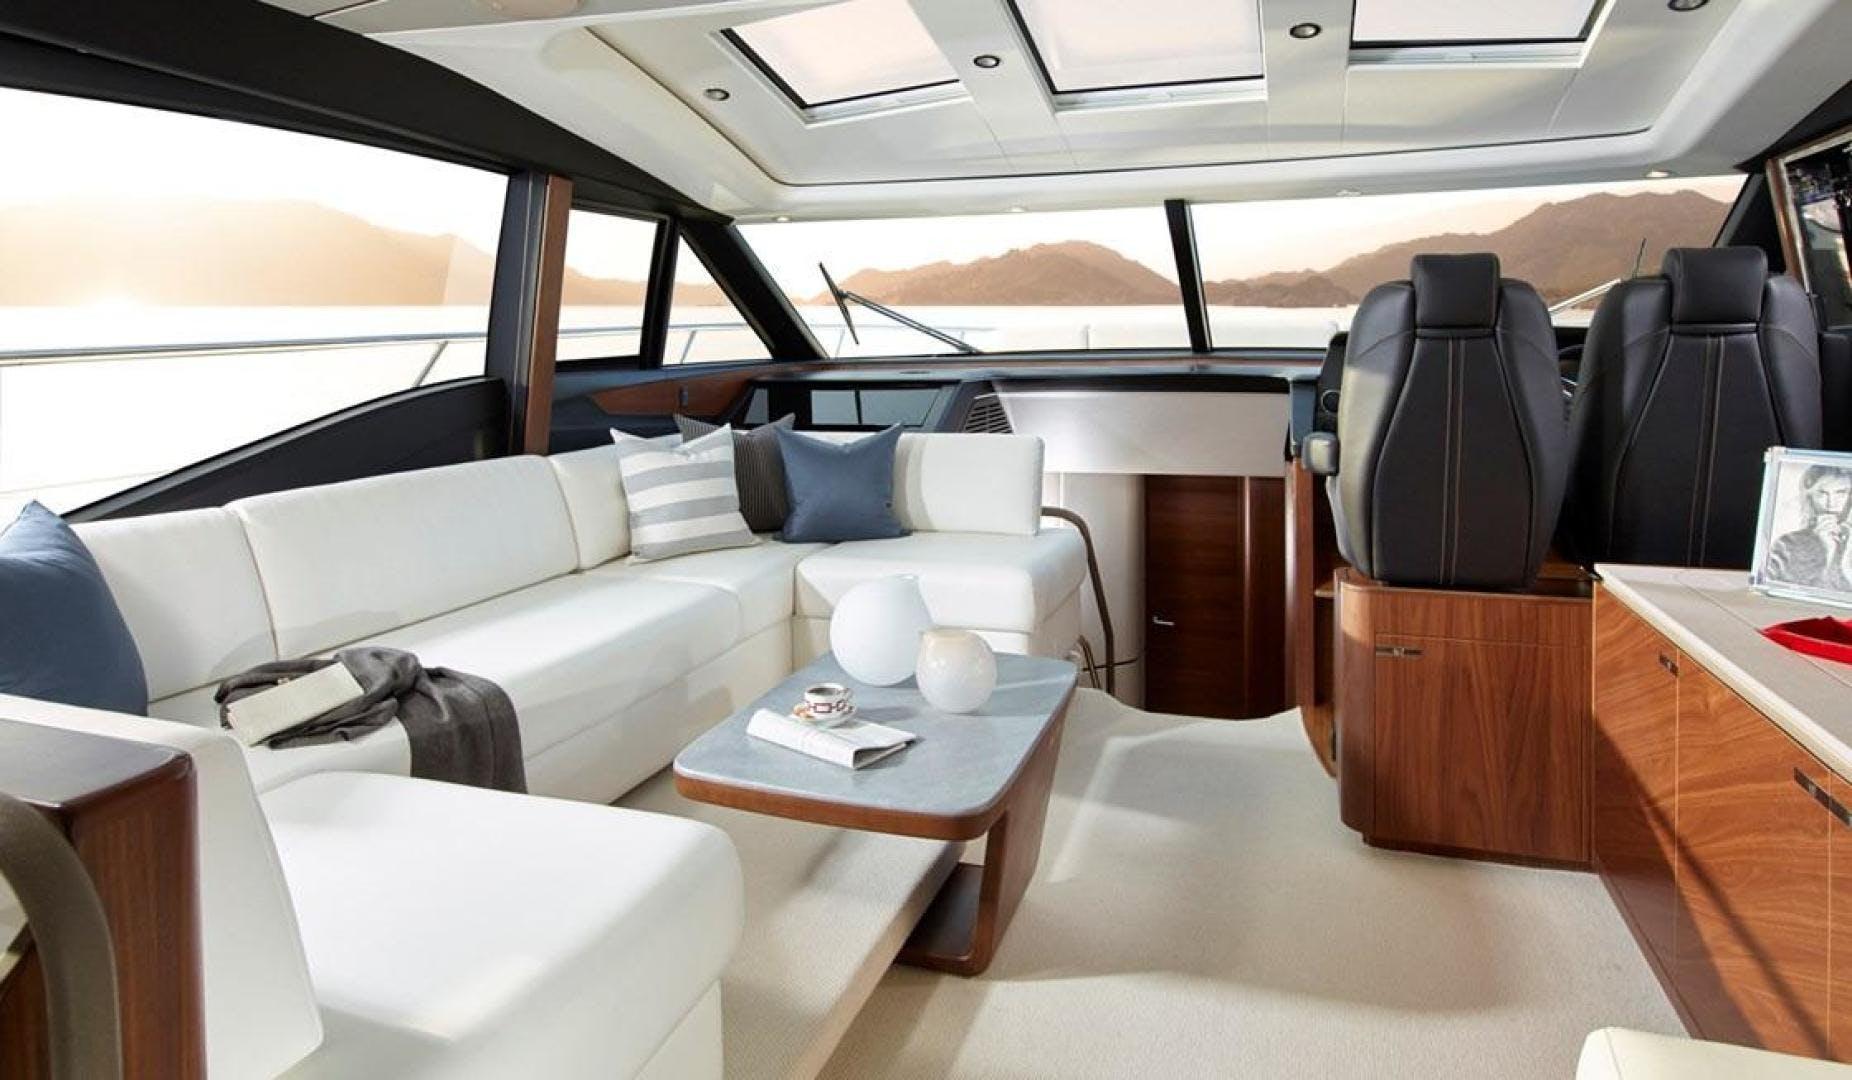 2017 Princess Yachts International 65' S65 Namaste   Picture 3 of 20